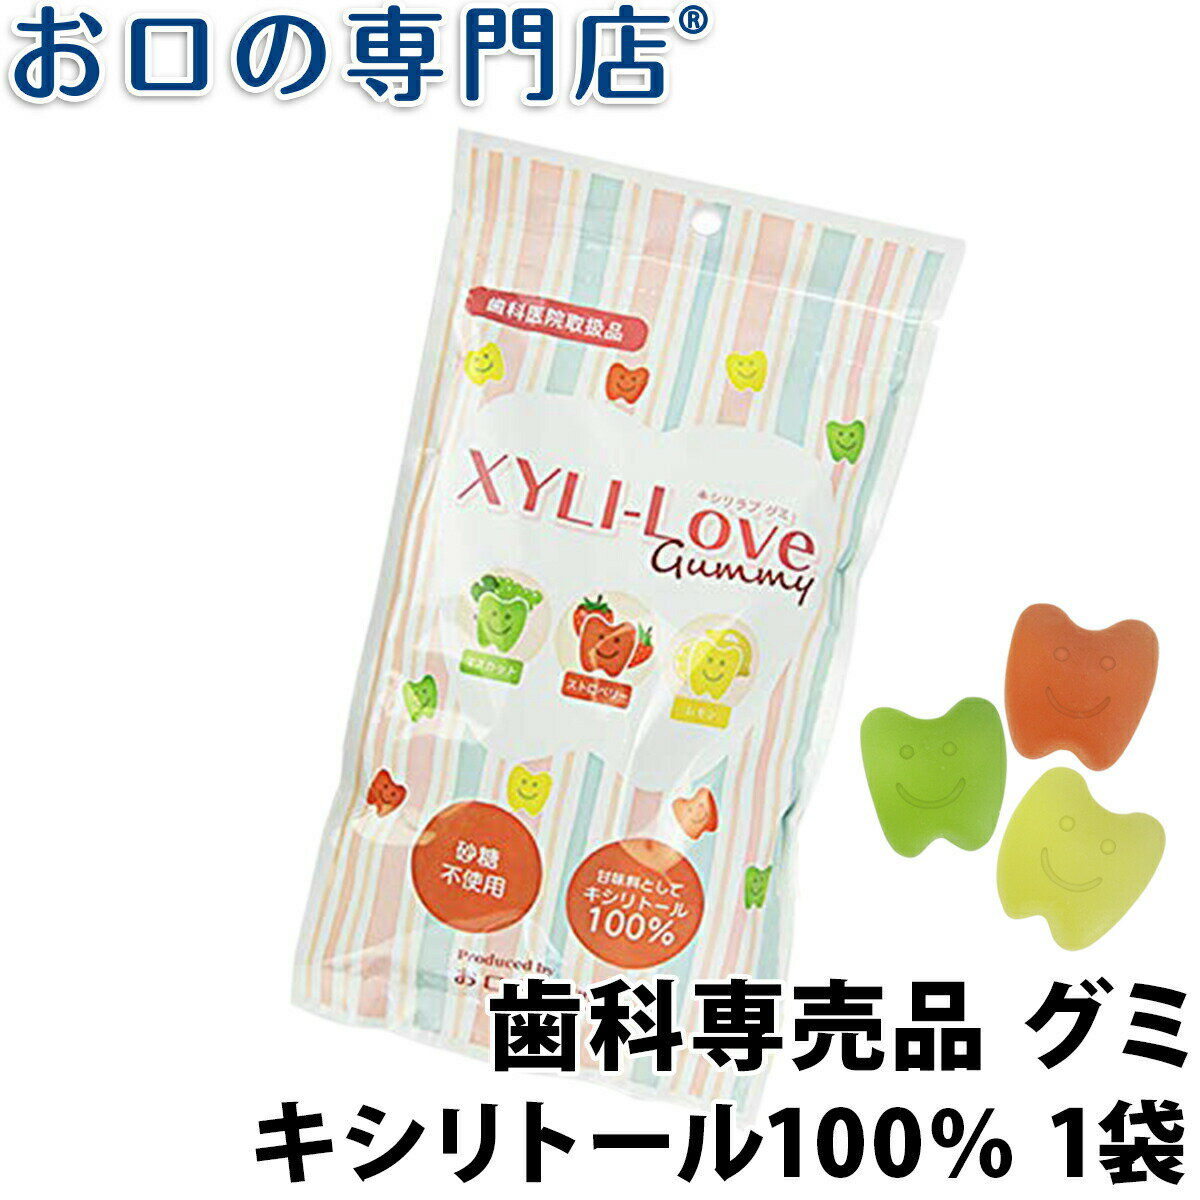 XYLI-LOVE(キシリラブ) グミ 24粒(96g) × 1袋  歯科専売品【ゆうパケット(メール便)OK】